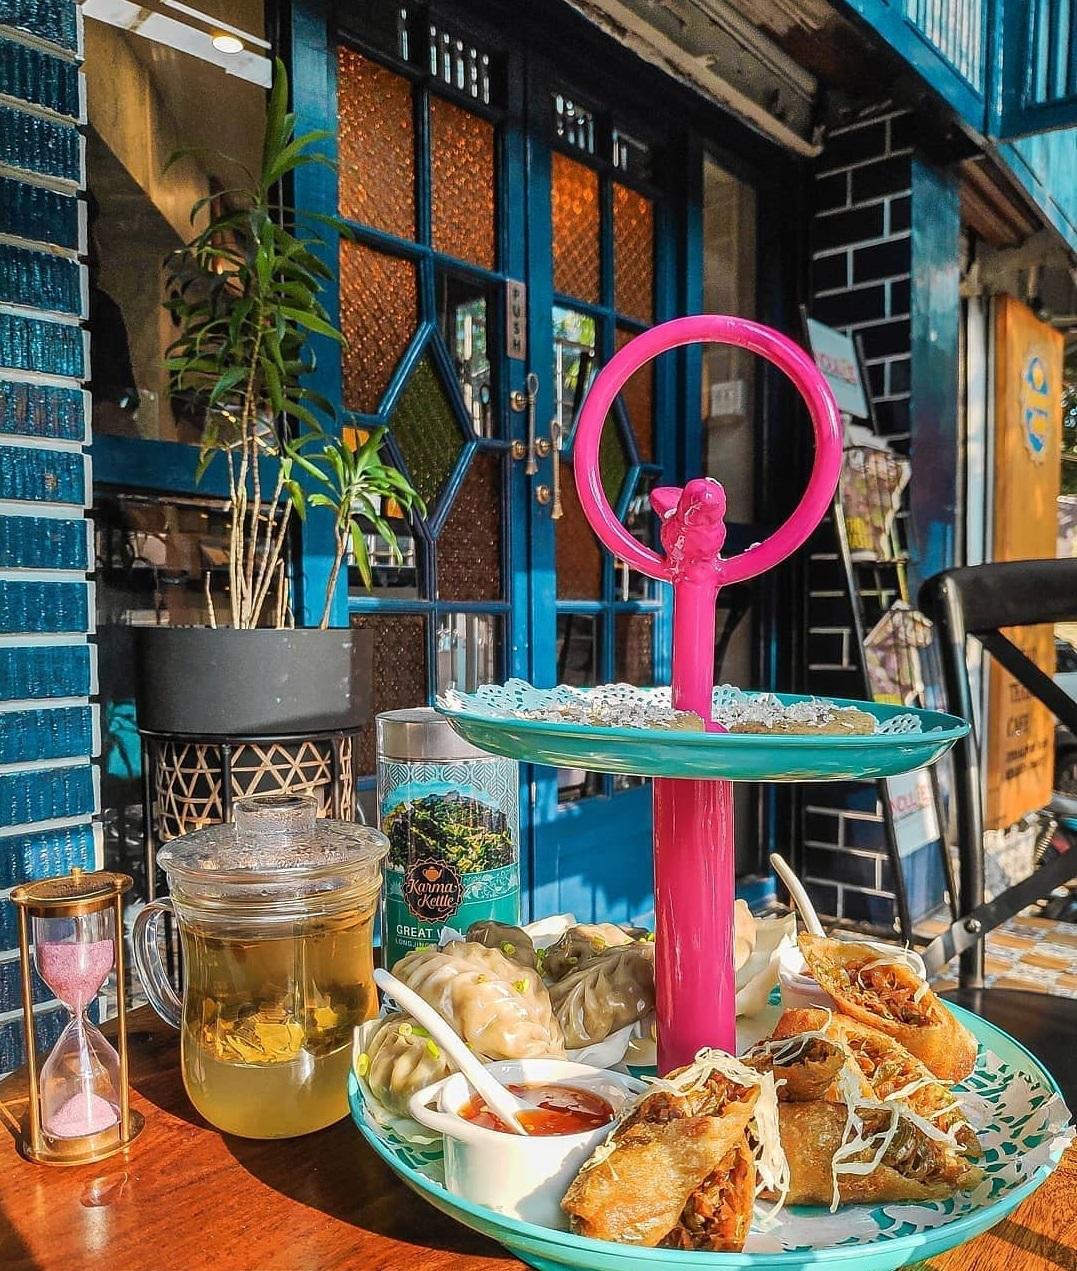 6 places to visit in Kolkata- Karma Kettle Tea, Elgin Hotels and Resorts